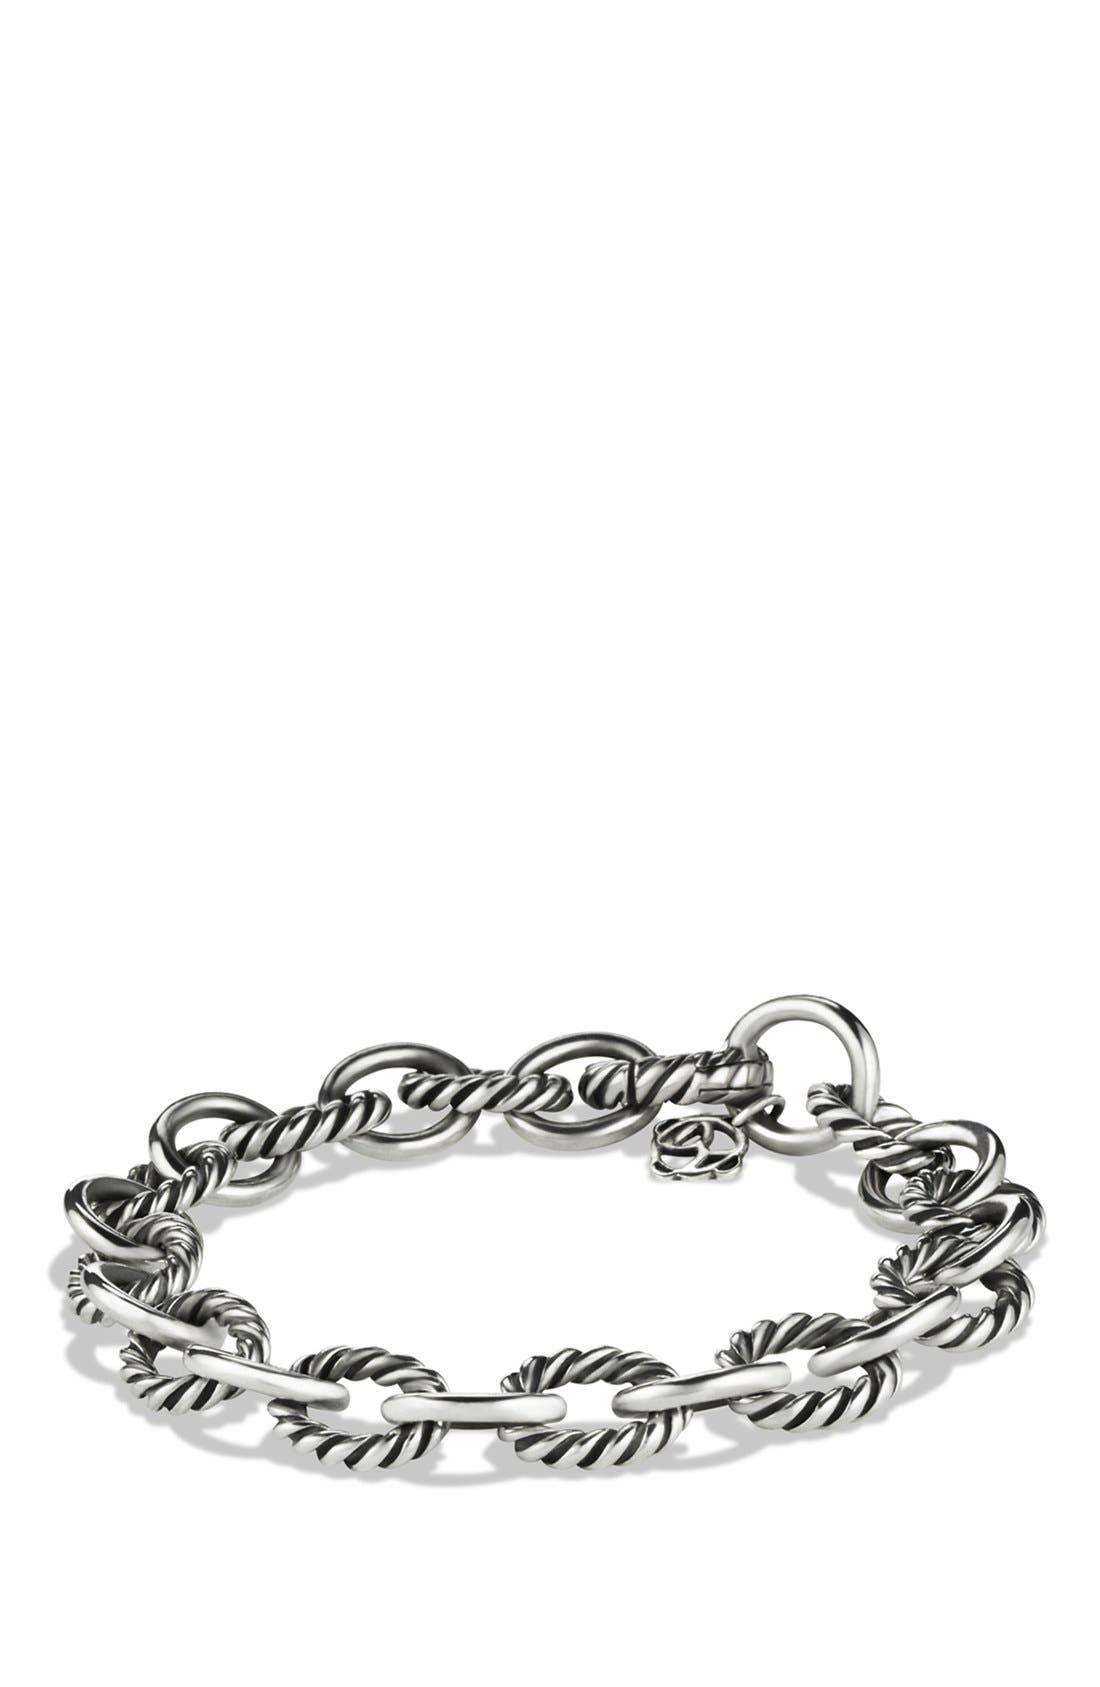 Alternate Image 1 Selected - David Yurman 'Oval' Link Bracelet